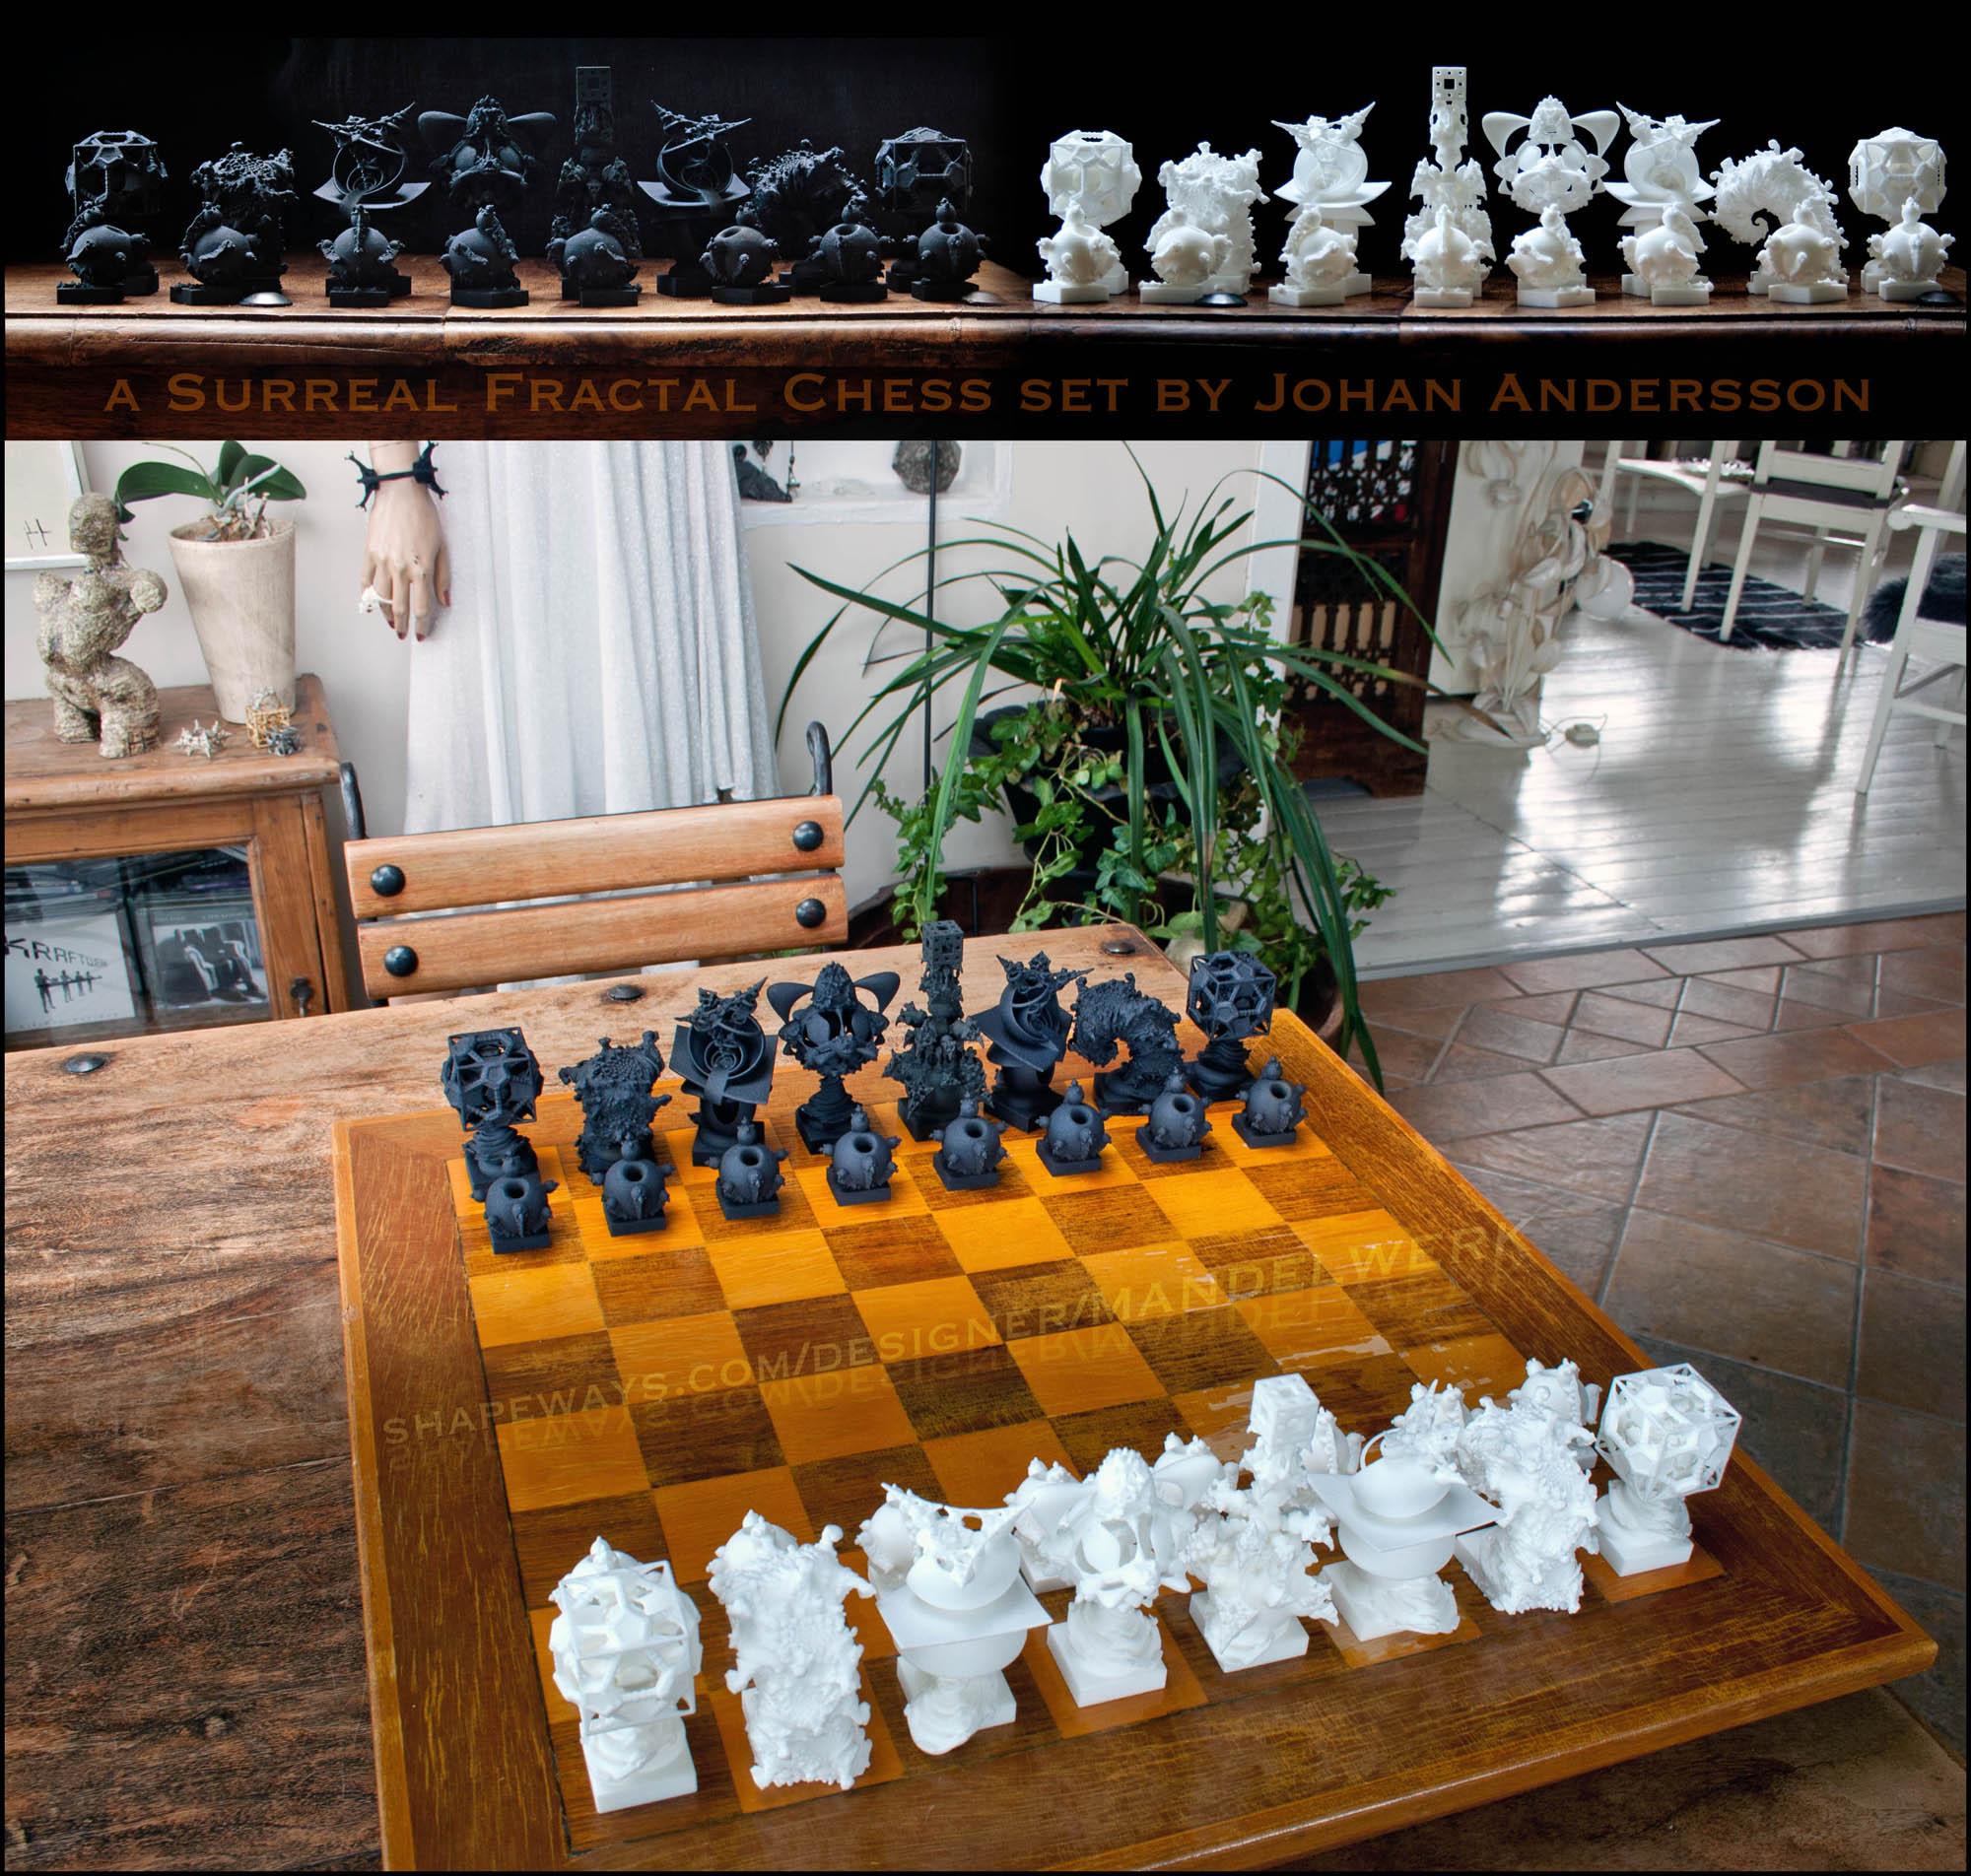 http://fc06.deviantart.net/fs71/f/2015/038/f/e/surreal_fractal_3d_printed_chess___the_set___irl_by_mandelwerk-d8h09ux.jpg